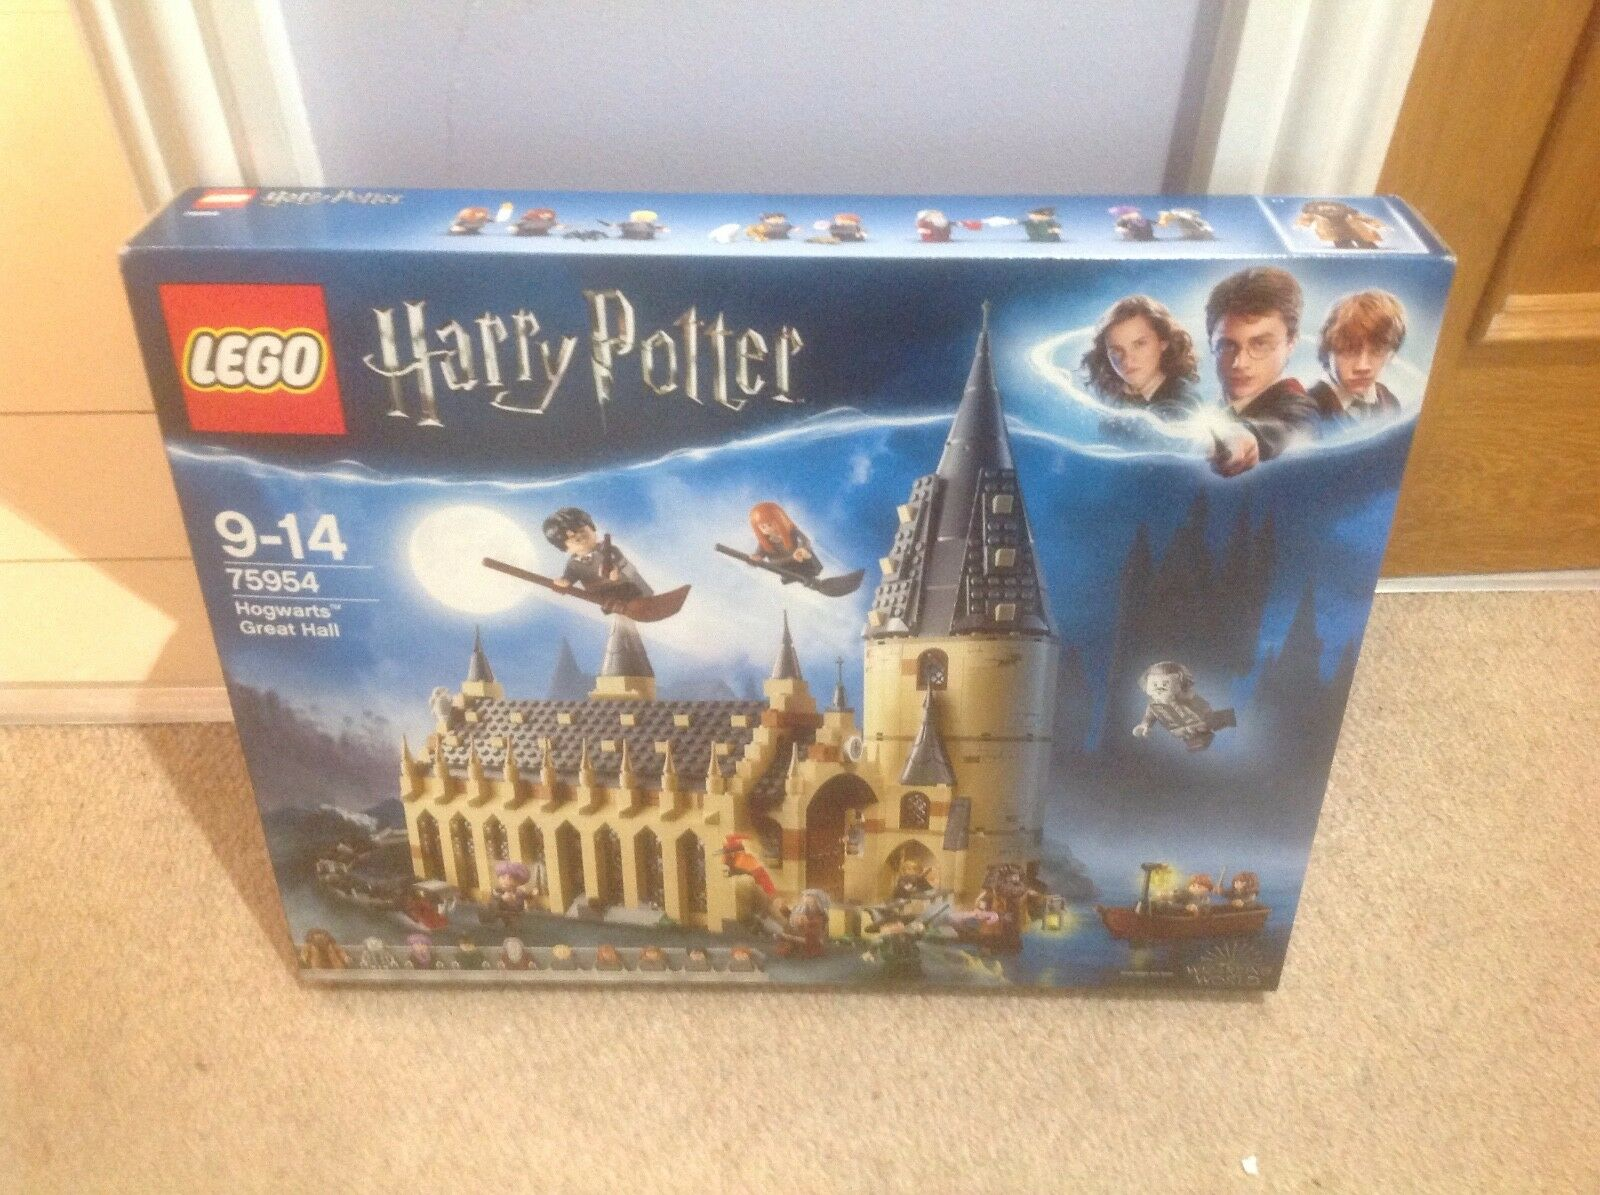 Lego Lego Lego Harry Potter Hogwarts Great Hall NEW IN BOx 84a8b5